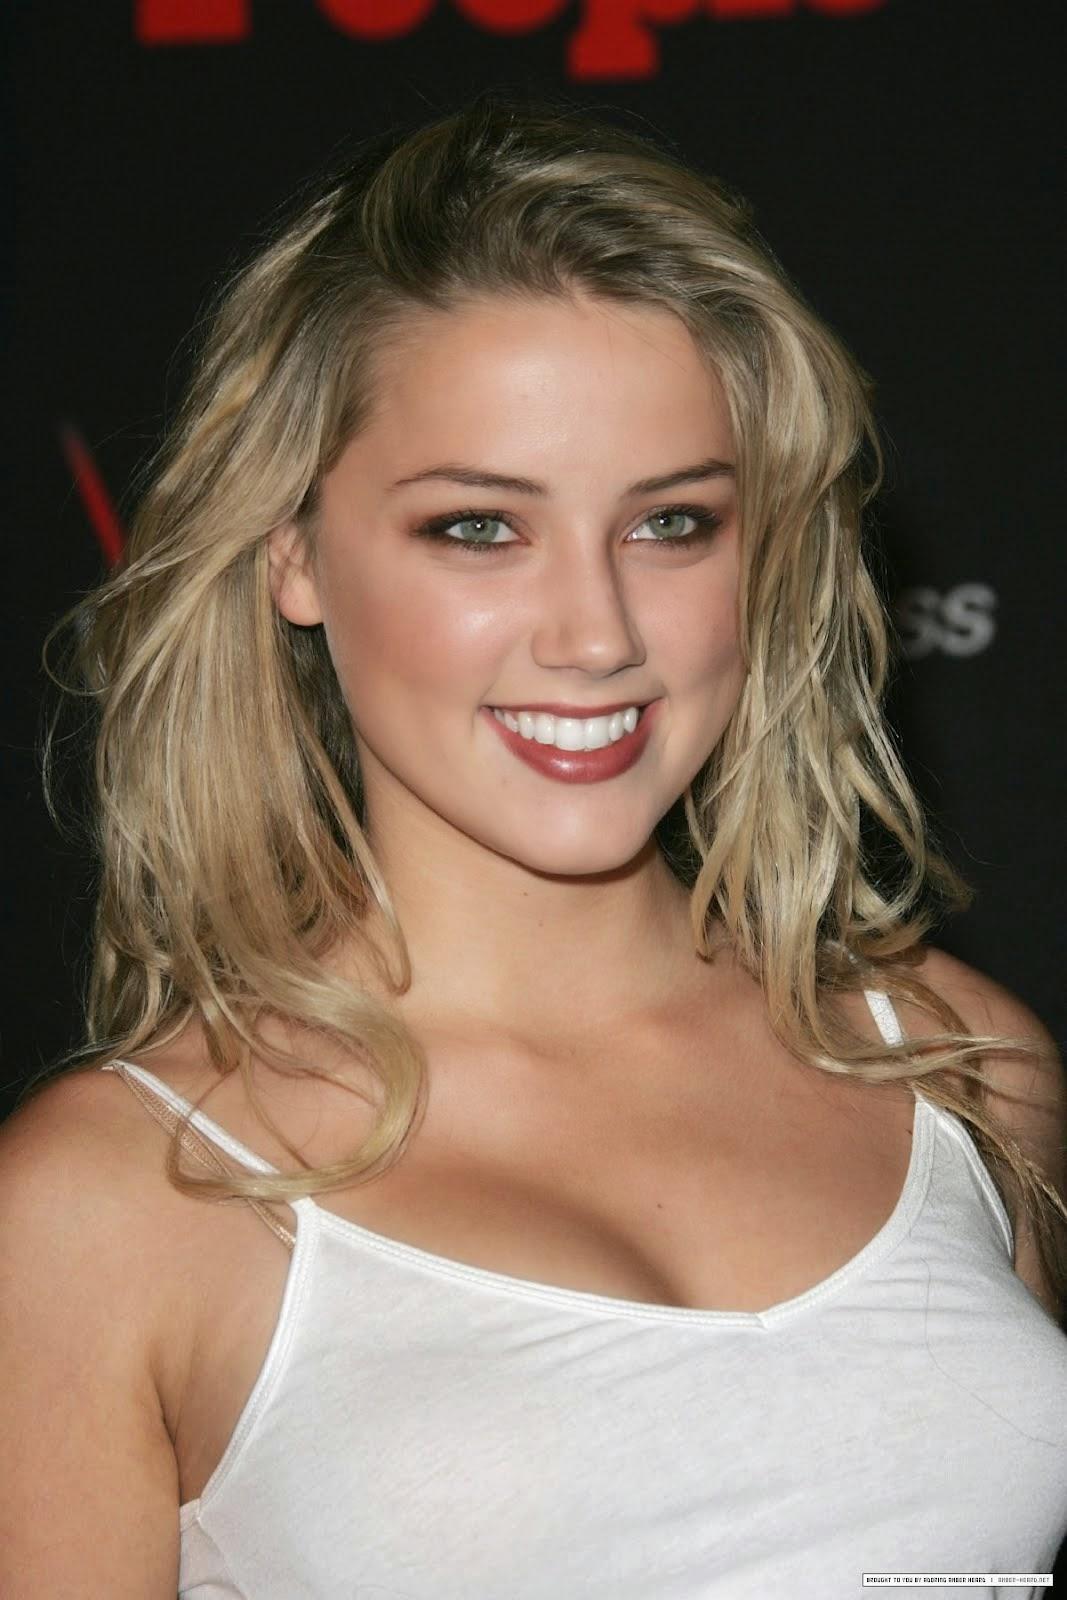 Amber Heard Is The Most Scientifically Beautiful Woman: Allen Leech Joins 'Hunter's Prayer'; 'The Danish Girl